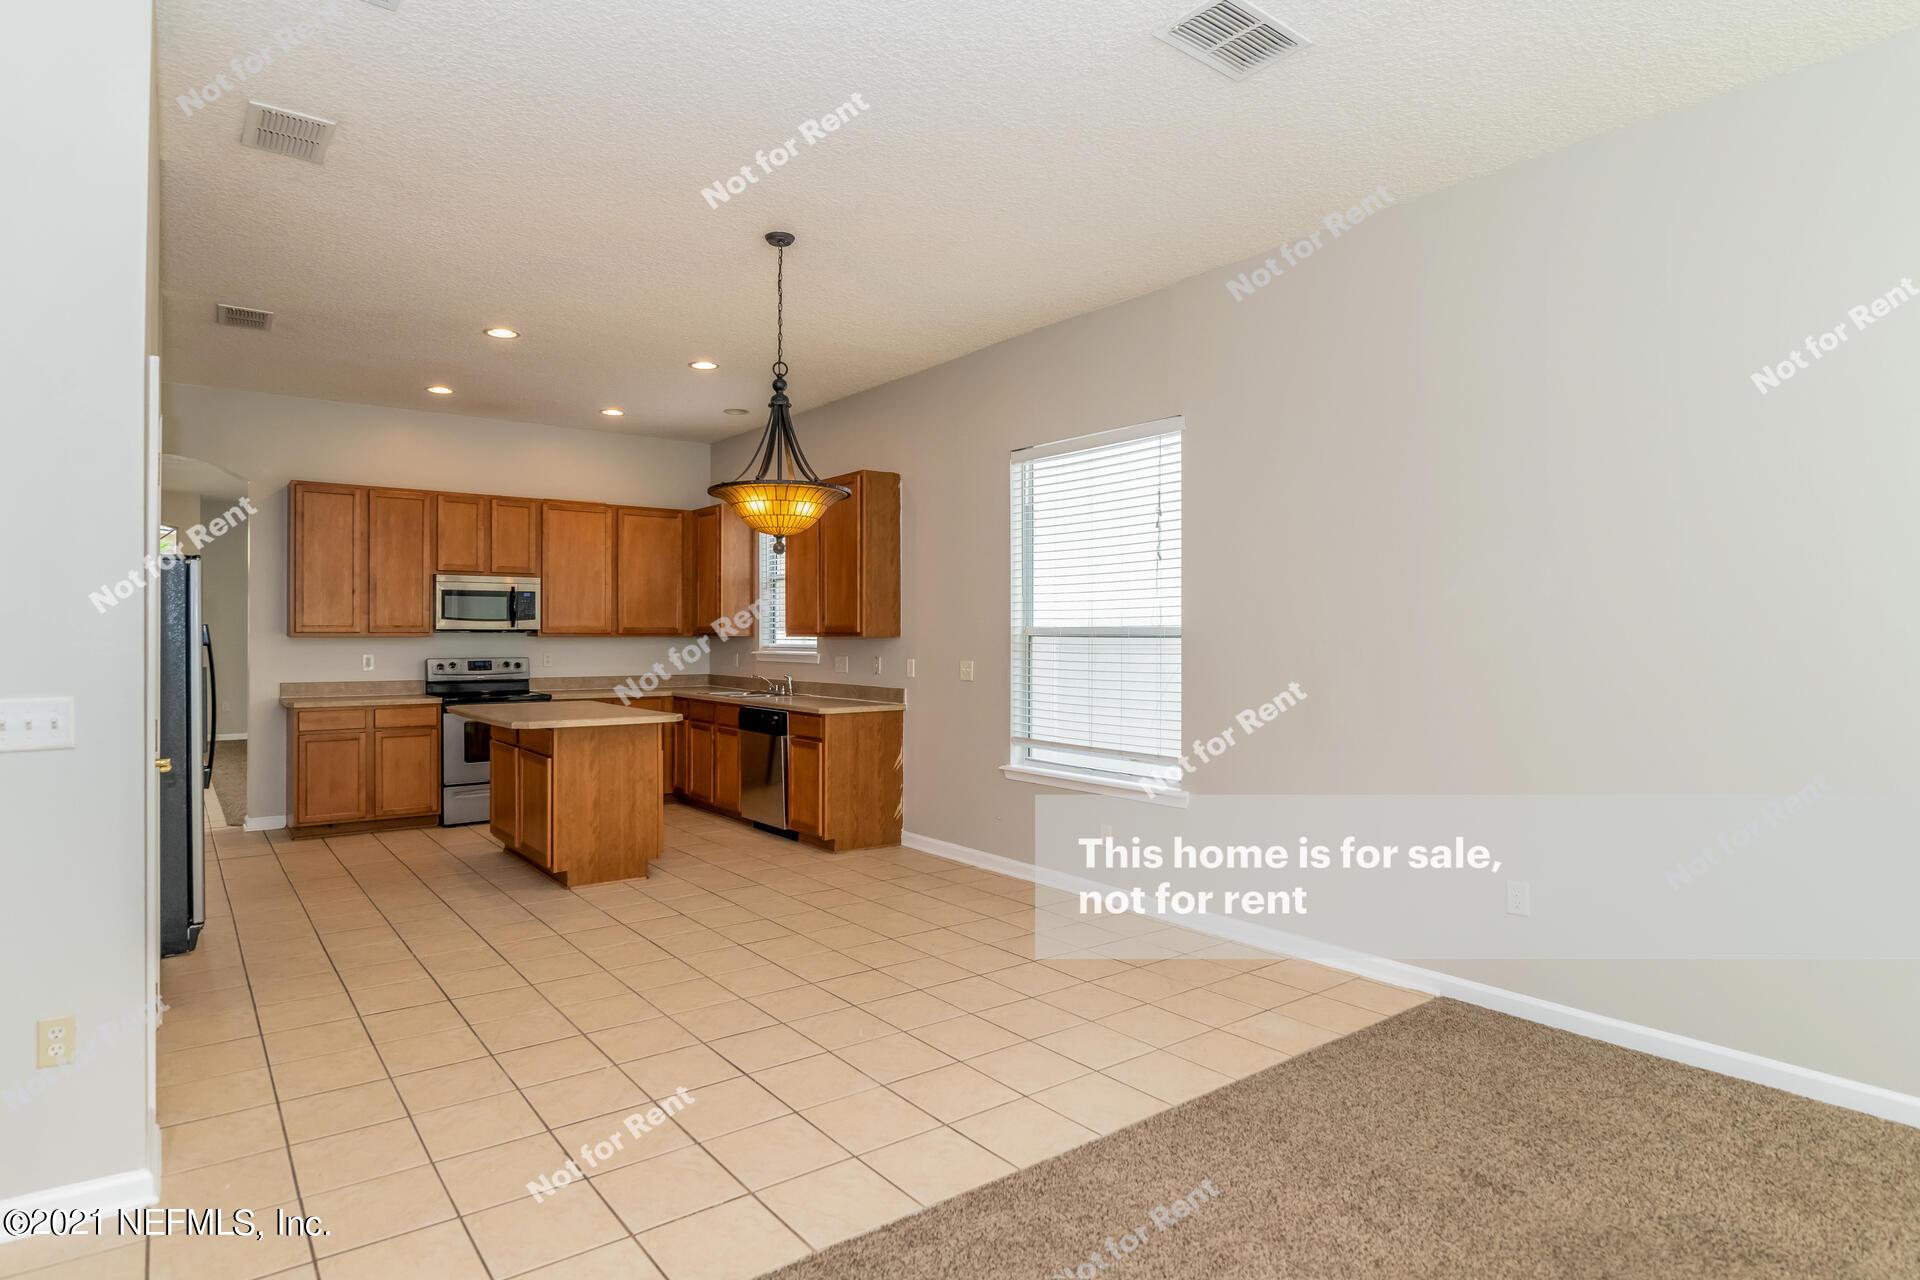 4023 LEATHERWOOD, ORANGE PARK, FLORIDA 32065, 4 Bedrooms Bedrooms, ,2 BathroomsBathrooms,Residential,For sale,LEATHERWOOD,1130941